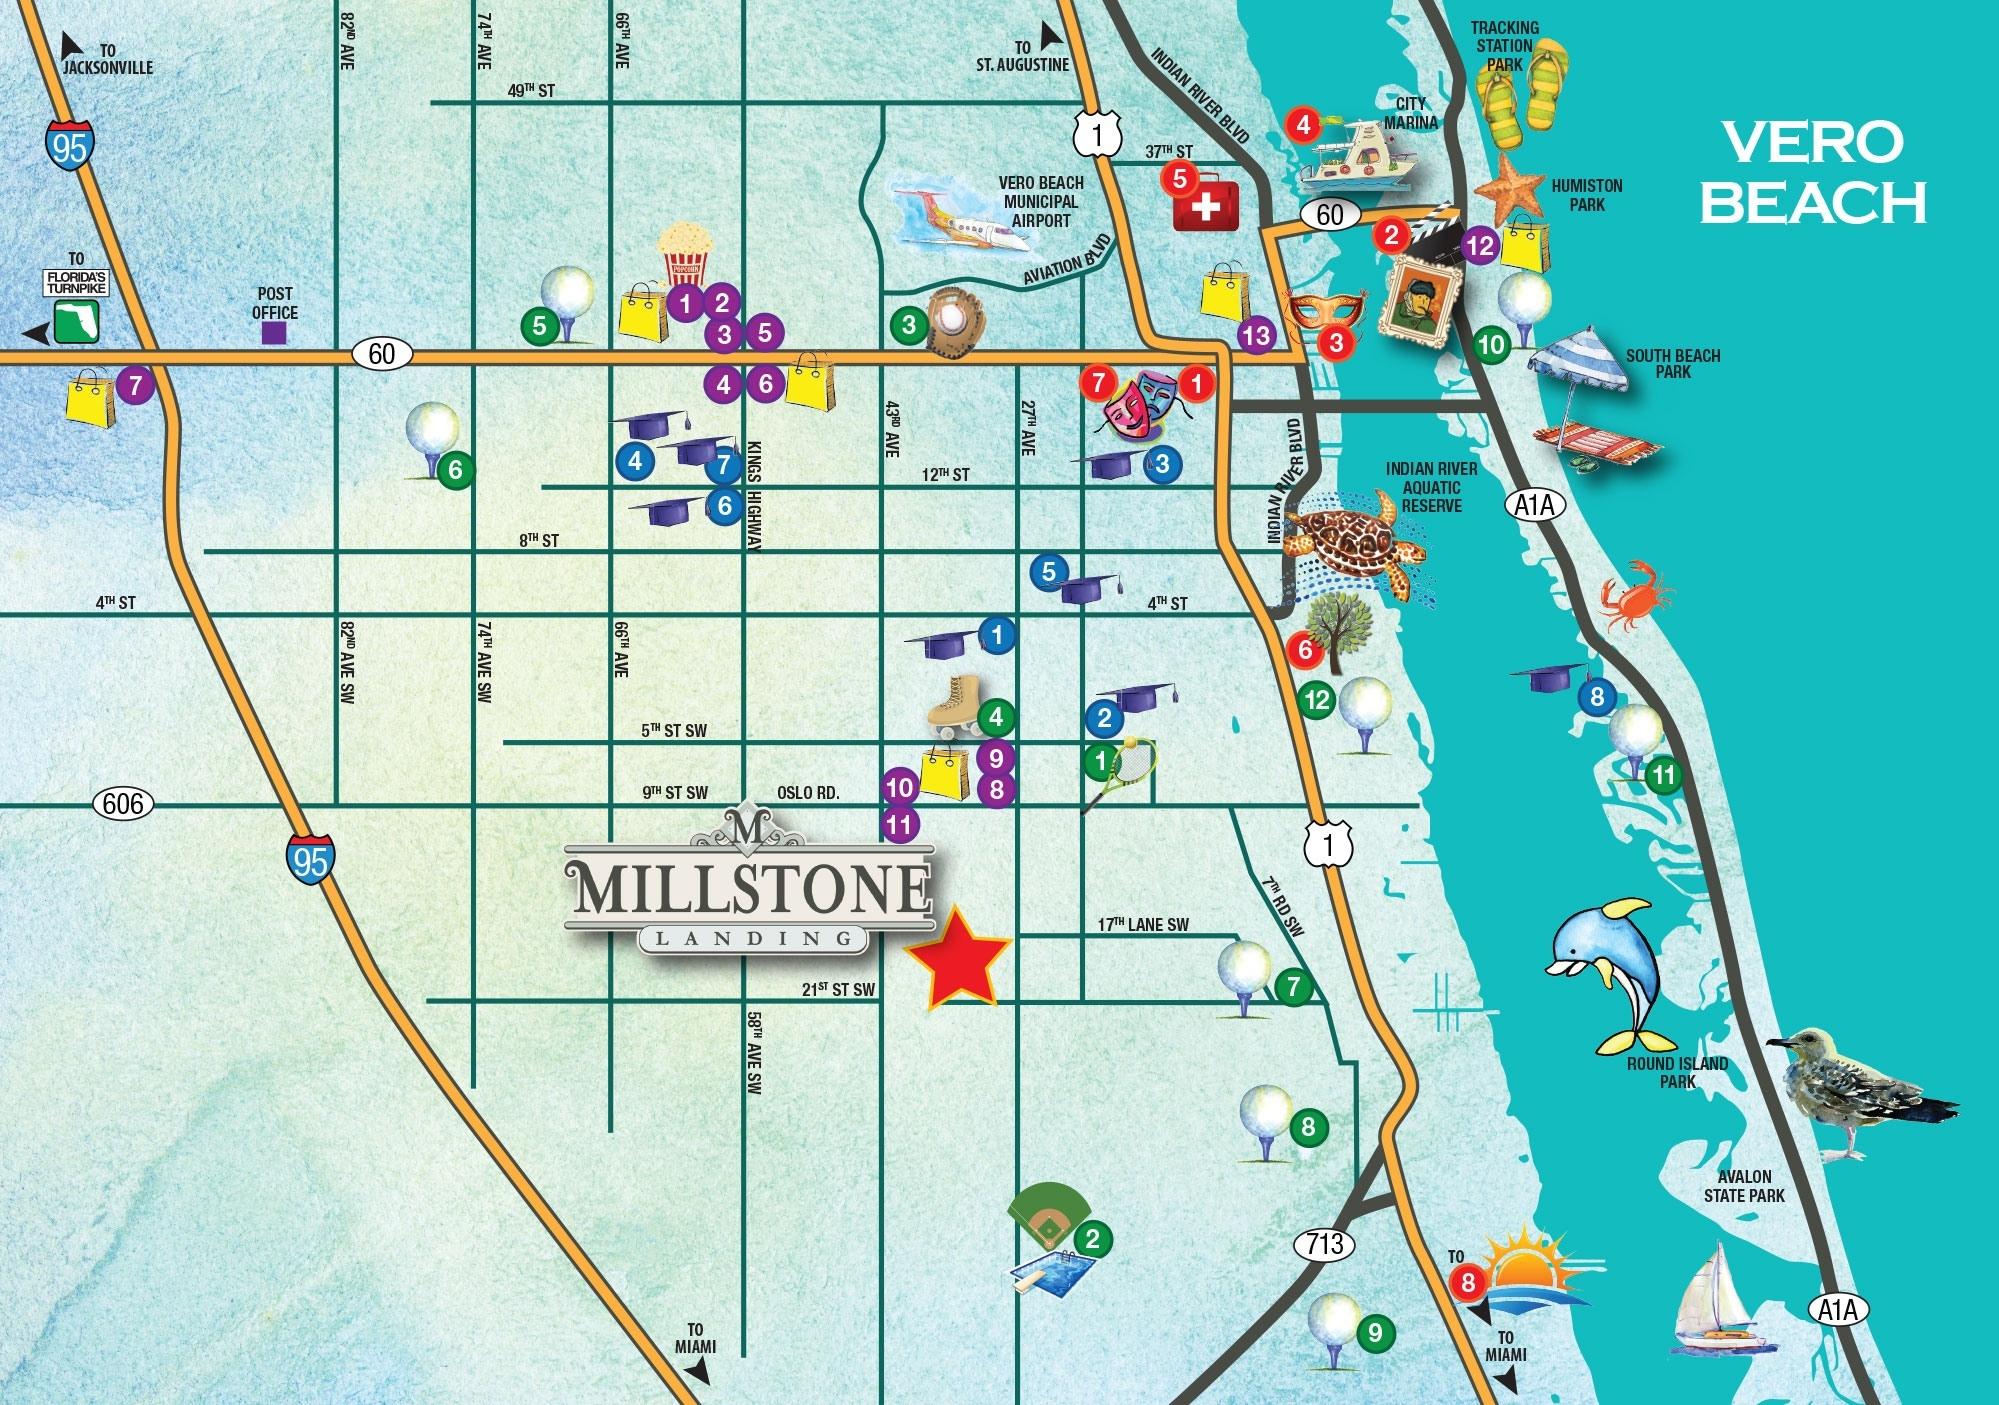 10 Hottest Vero Beach Florida Map 2018   Beach Destination - Where Is Vero Beach Florida On The Map